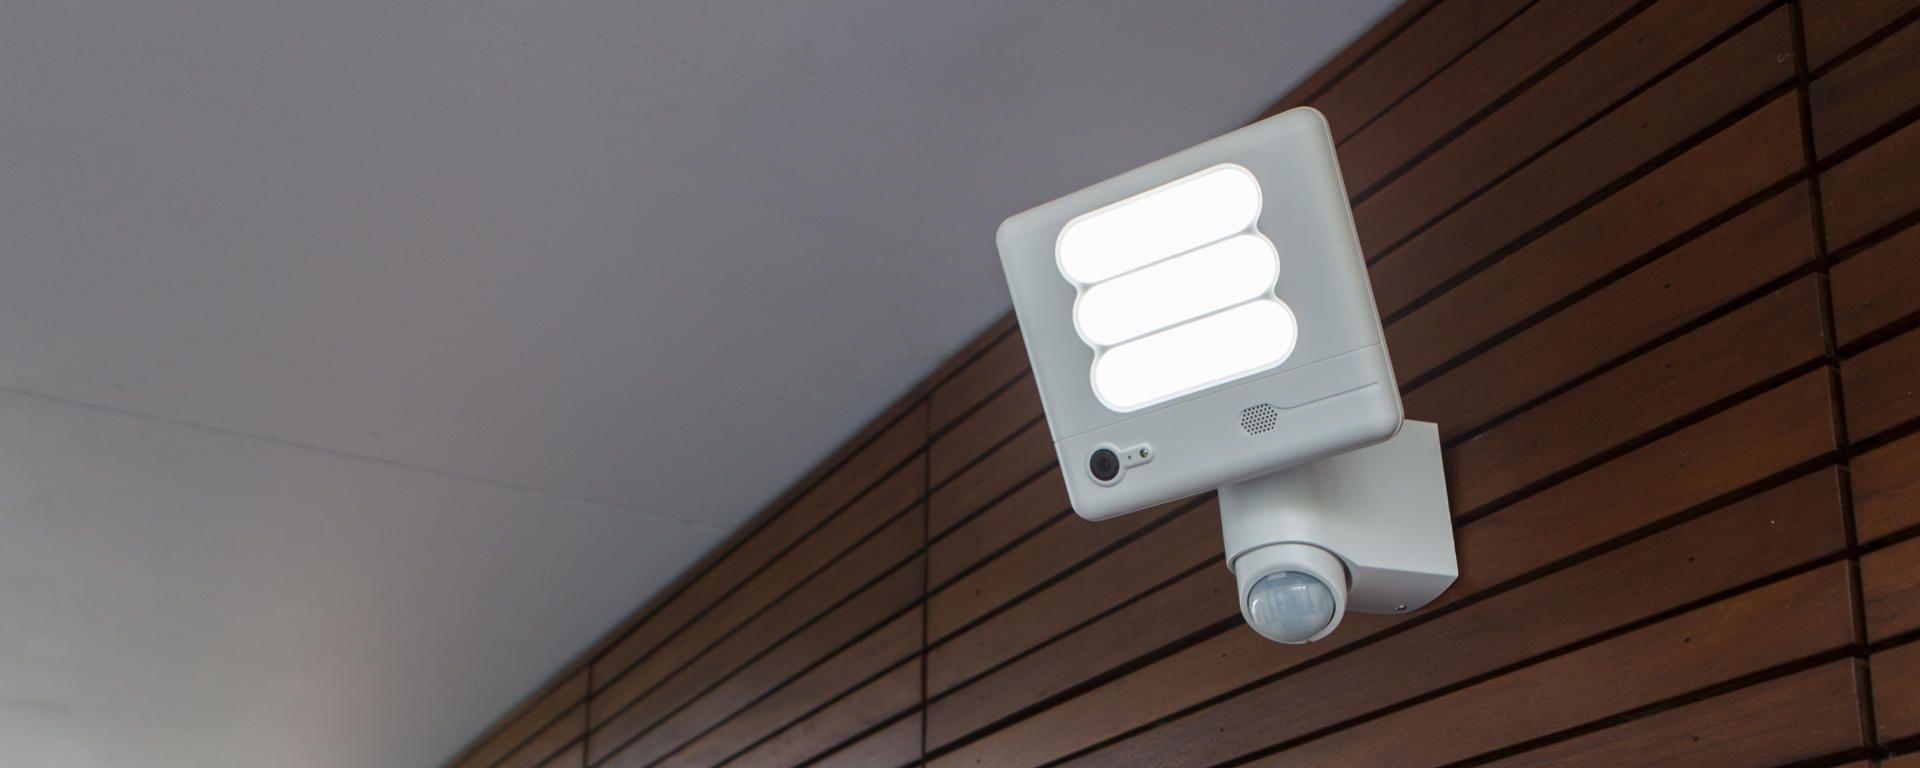 Alert Electrical - Lutec Lighting